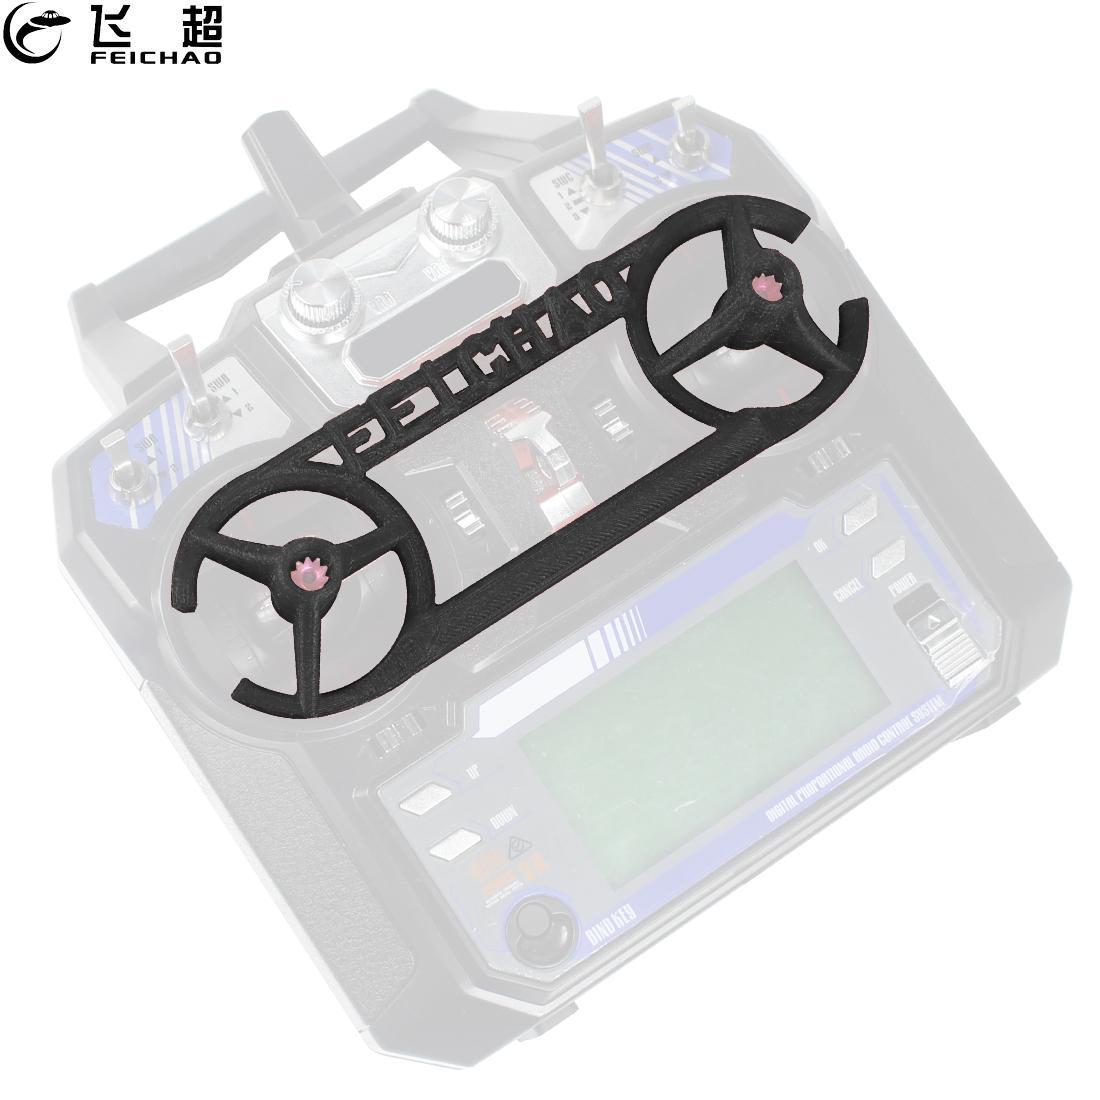 Barra de brazo balancín de Control remoto FEICHAO, soporte de protección de TPU impreso en 3D, soporte fijo para transmisor FS I6, Protector de Joysticks